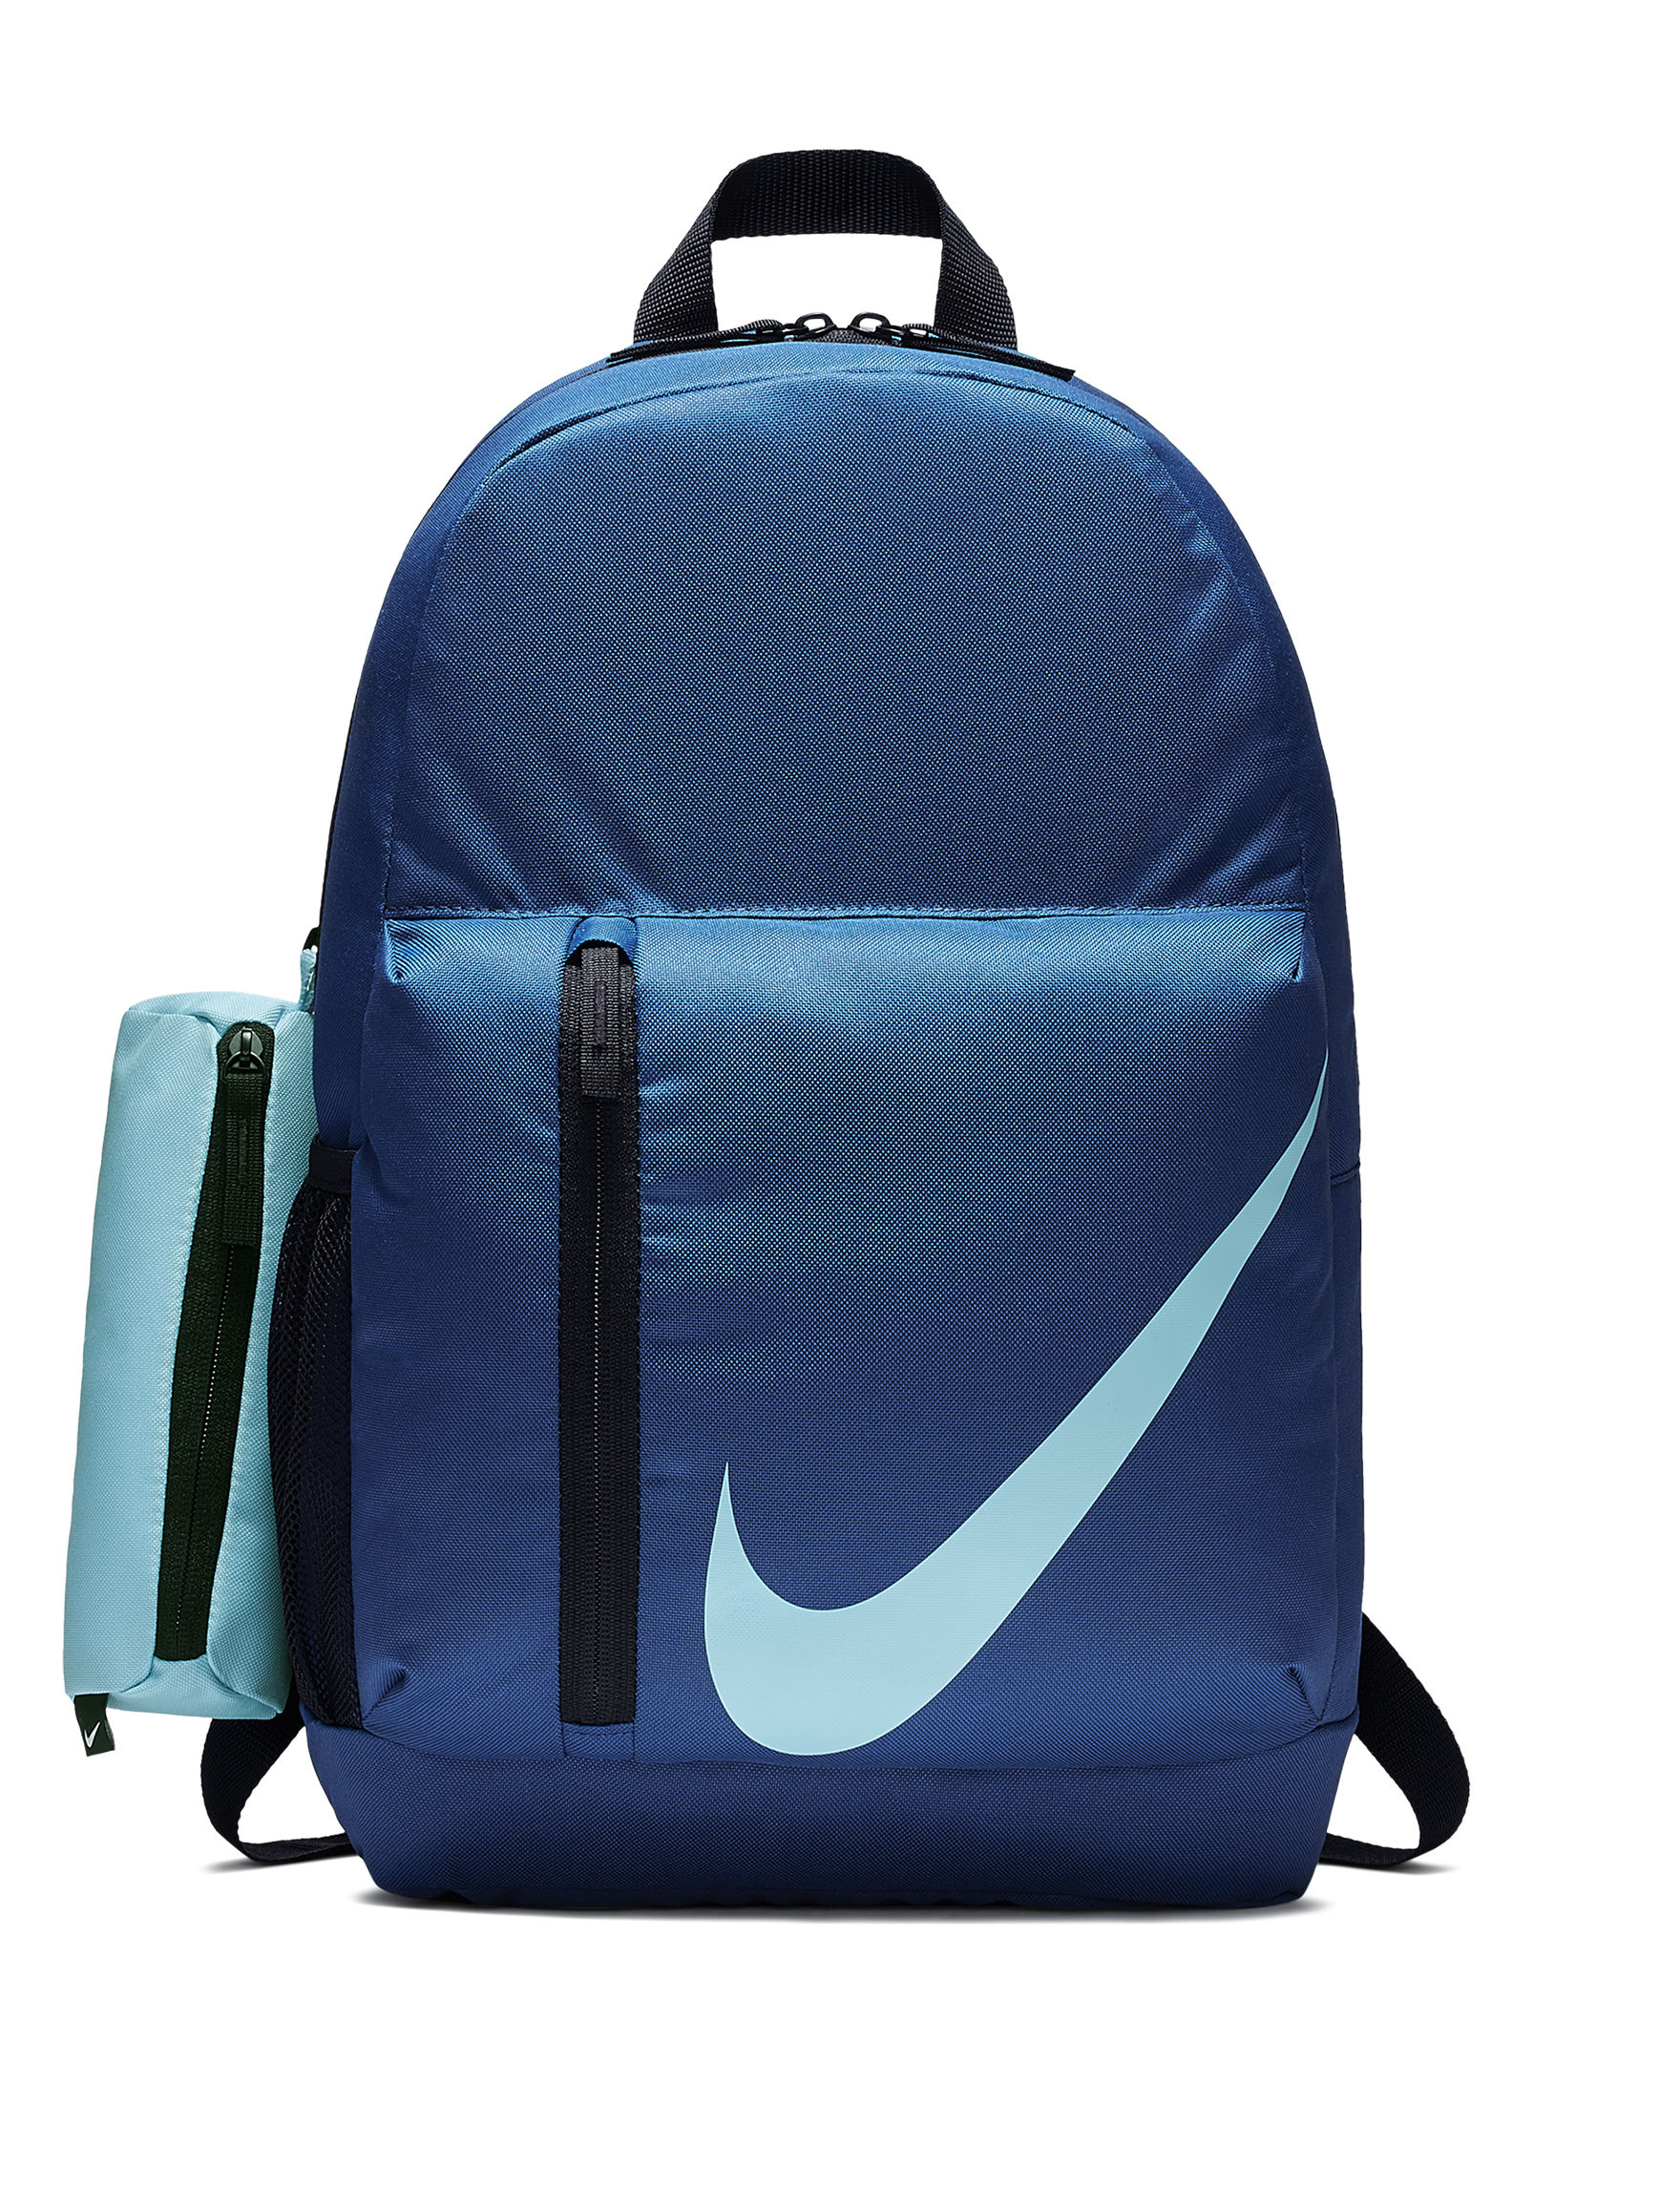 Nike Blue / Black Bookbags & Backpacks